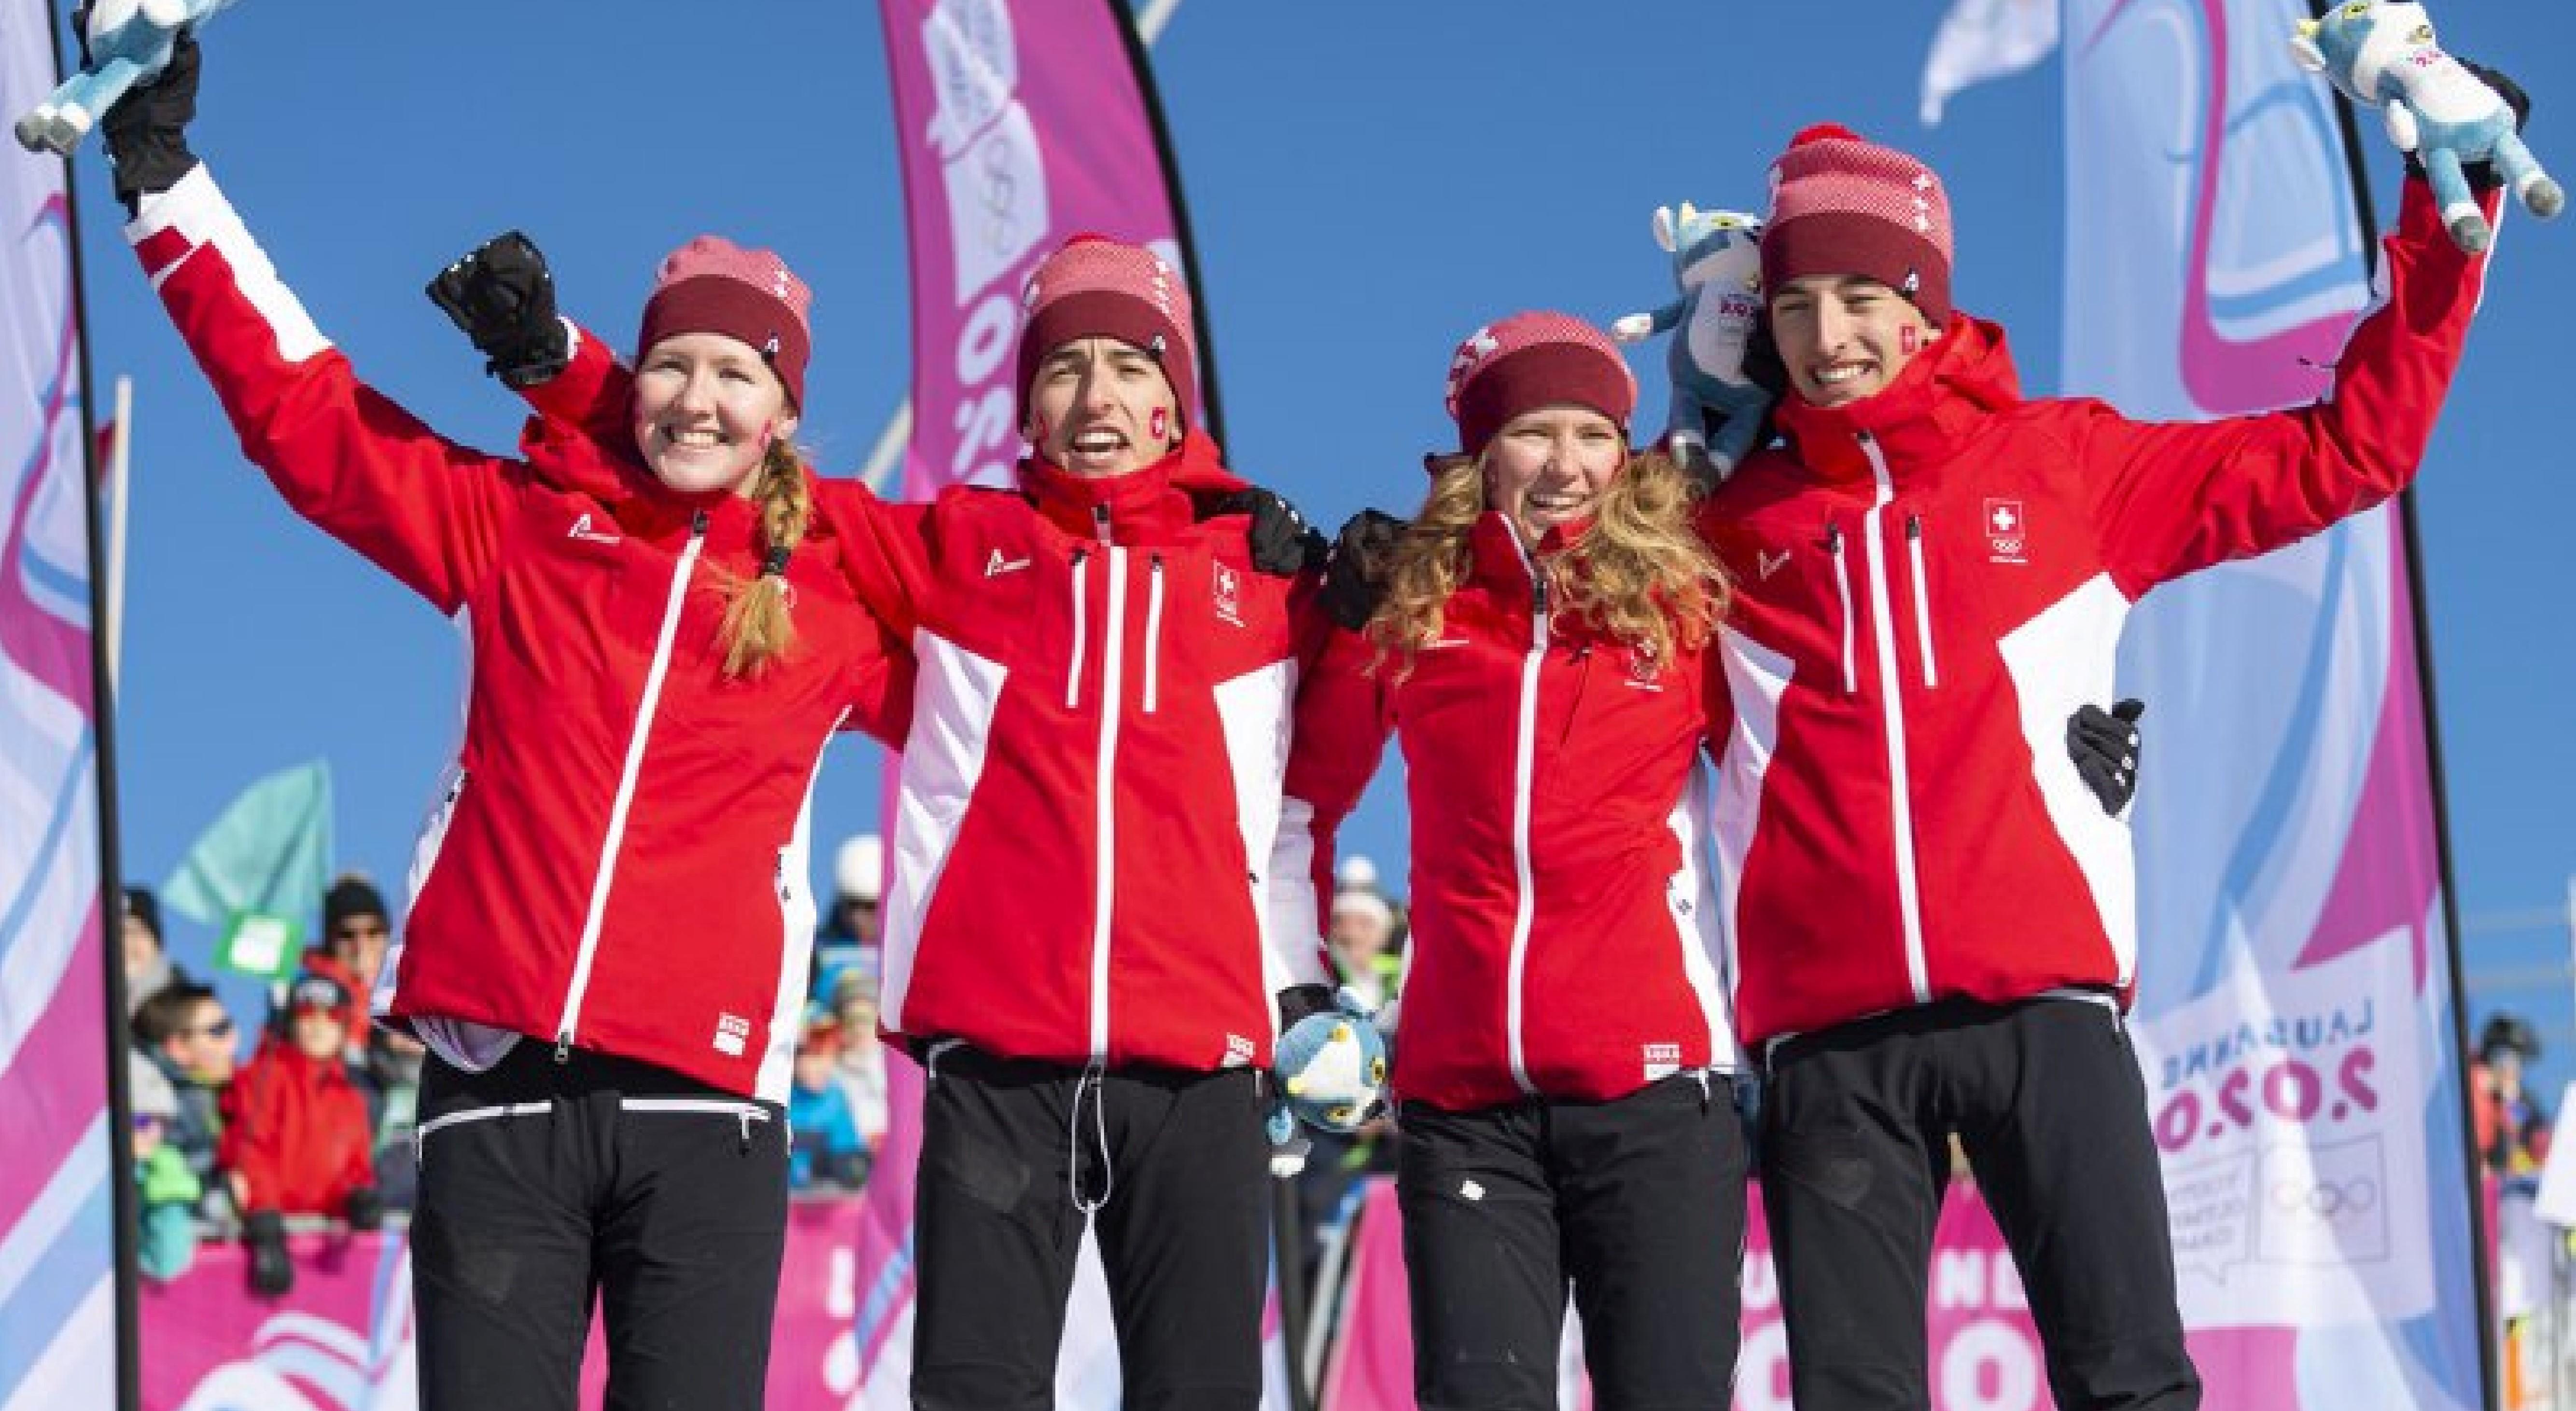 JOJ 2020 : Ski-alpinisme à Villars